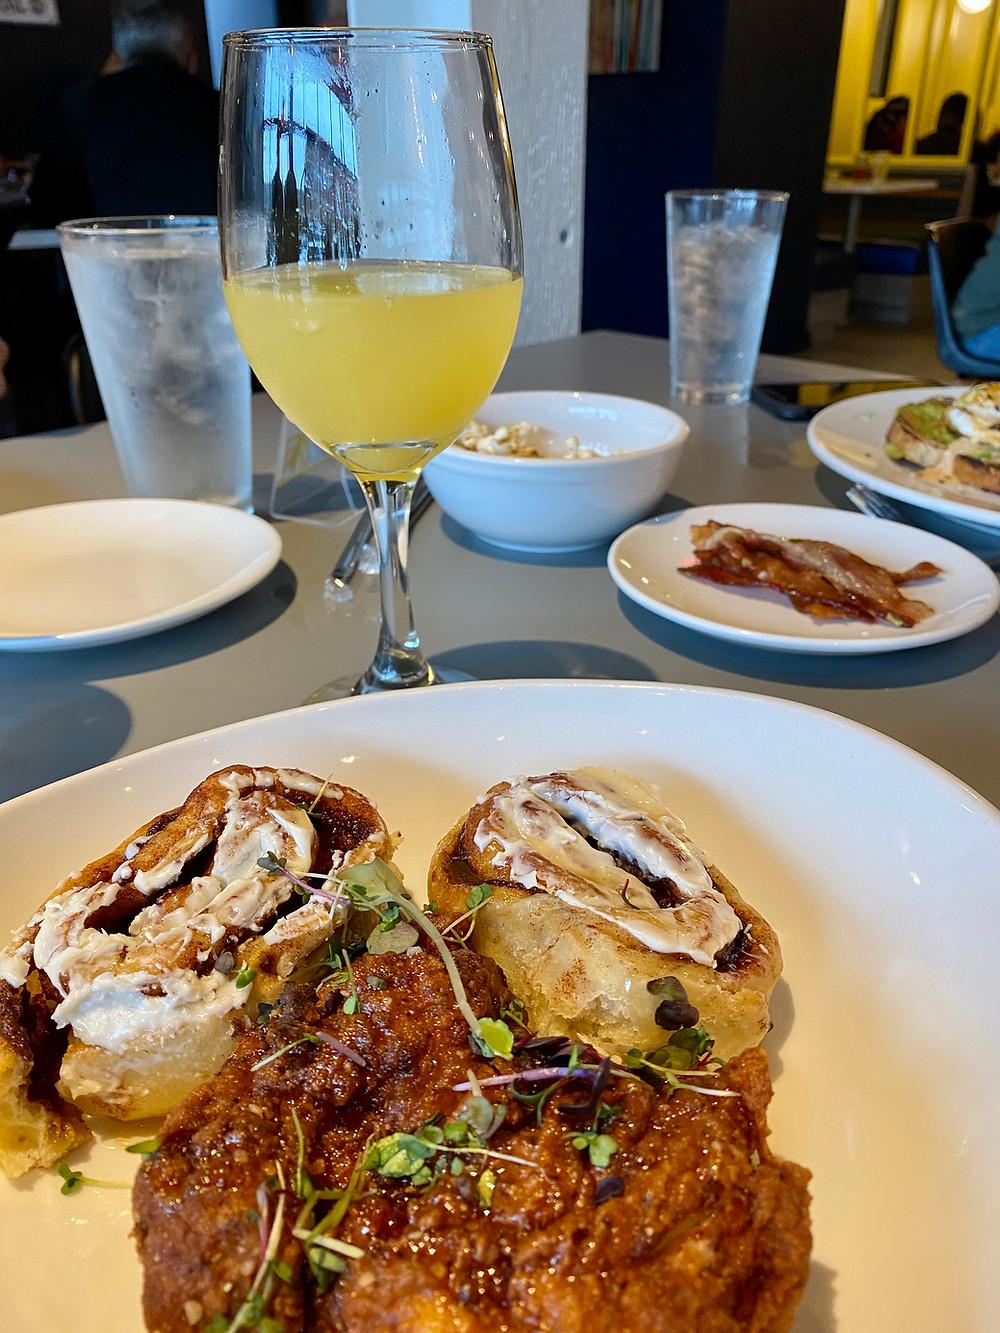 memphis-food-brunch-downtown-1